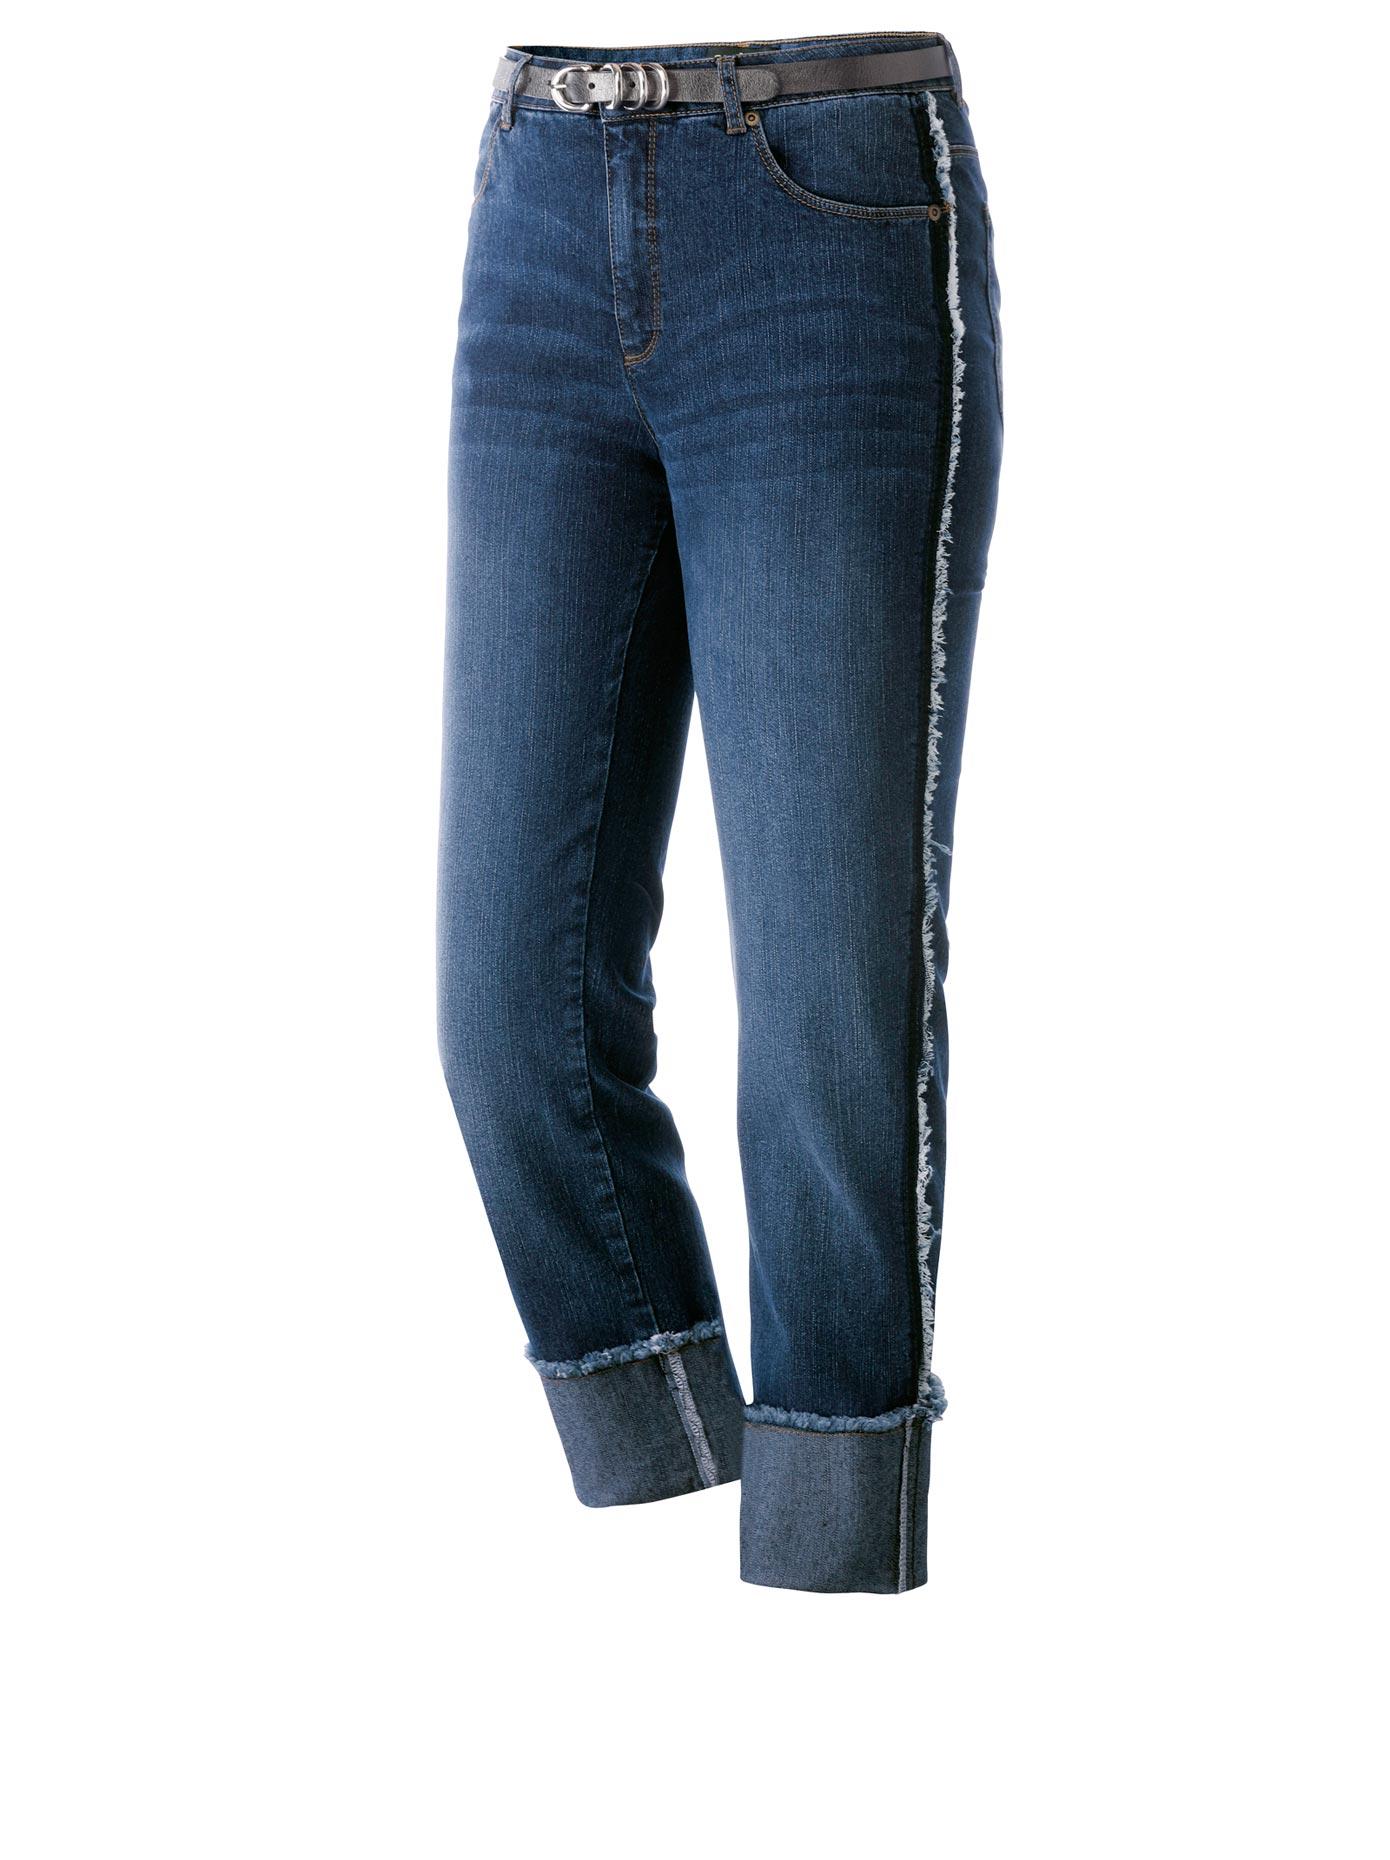 Image of Ambria Jeans im angesagtem Boyfriend-Stil